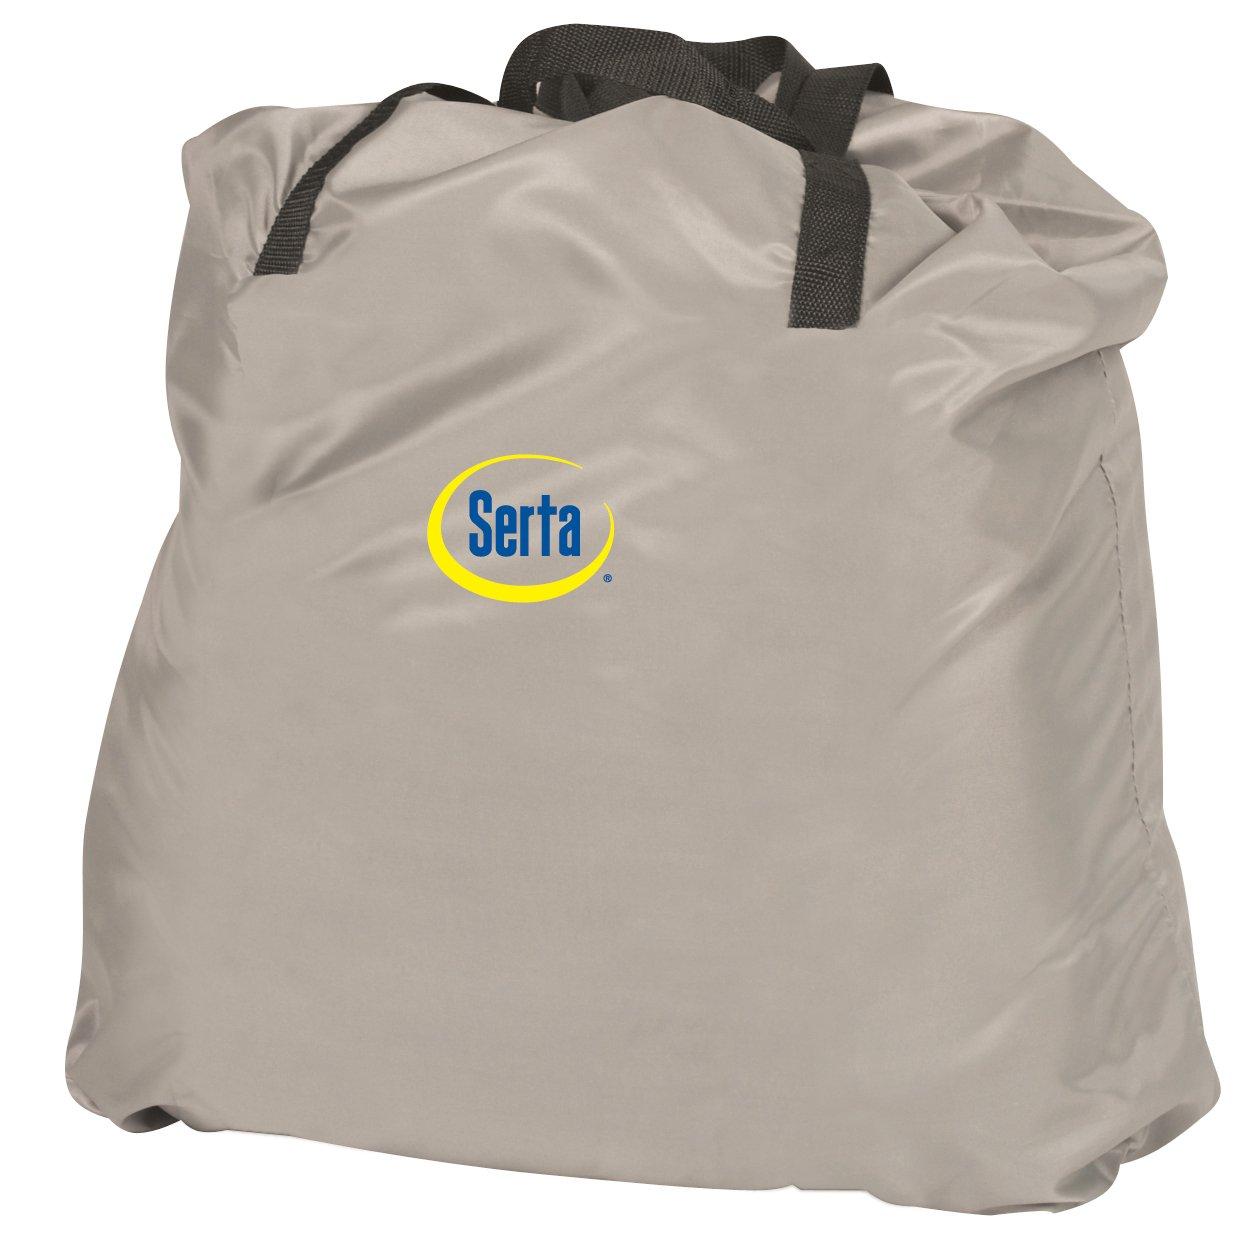 Amazon.com: Serta Raised Queen Pillow Top Air Mattress with Never Flat Pump: Sports & Outdoors